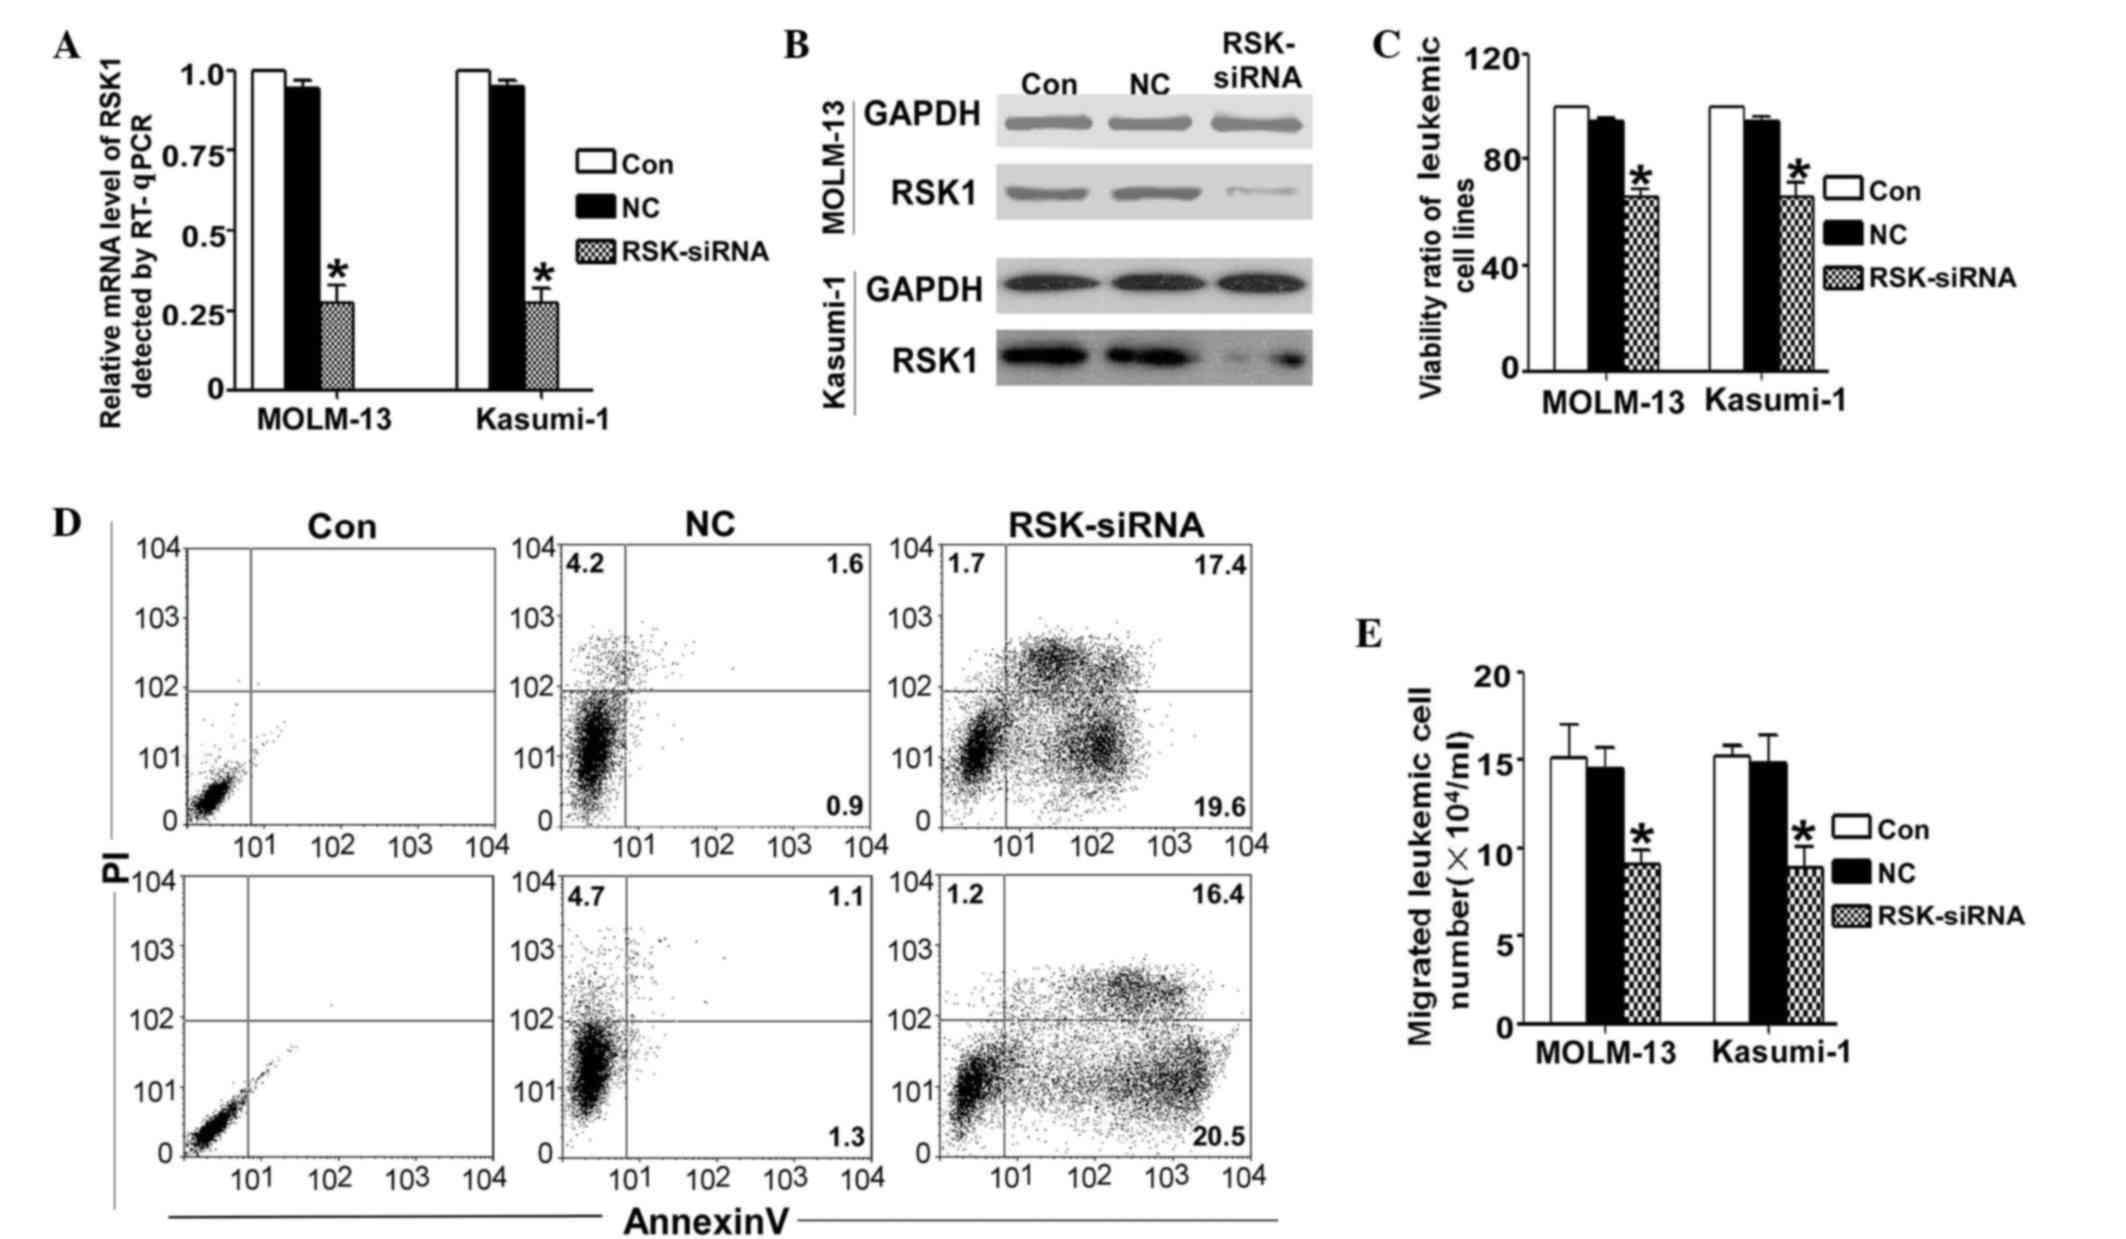 Luteolin a novel p90 ribosomal S6 kinase inhibitor suppresses